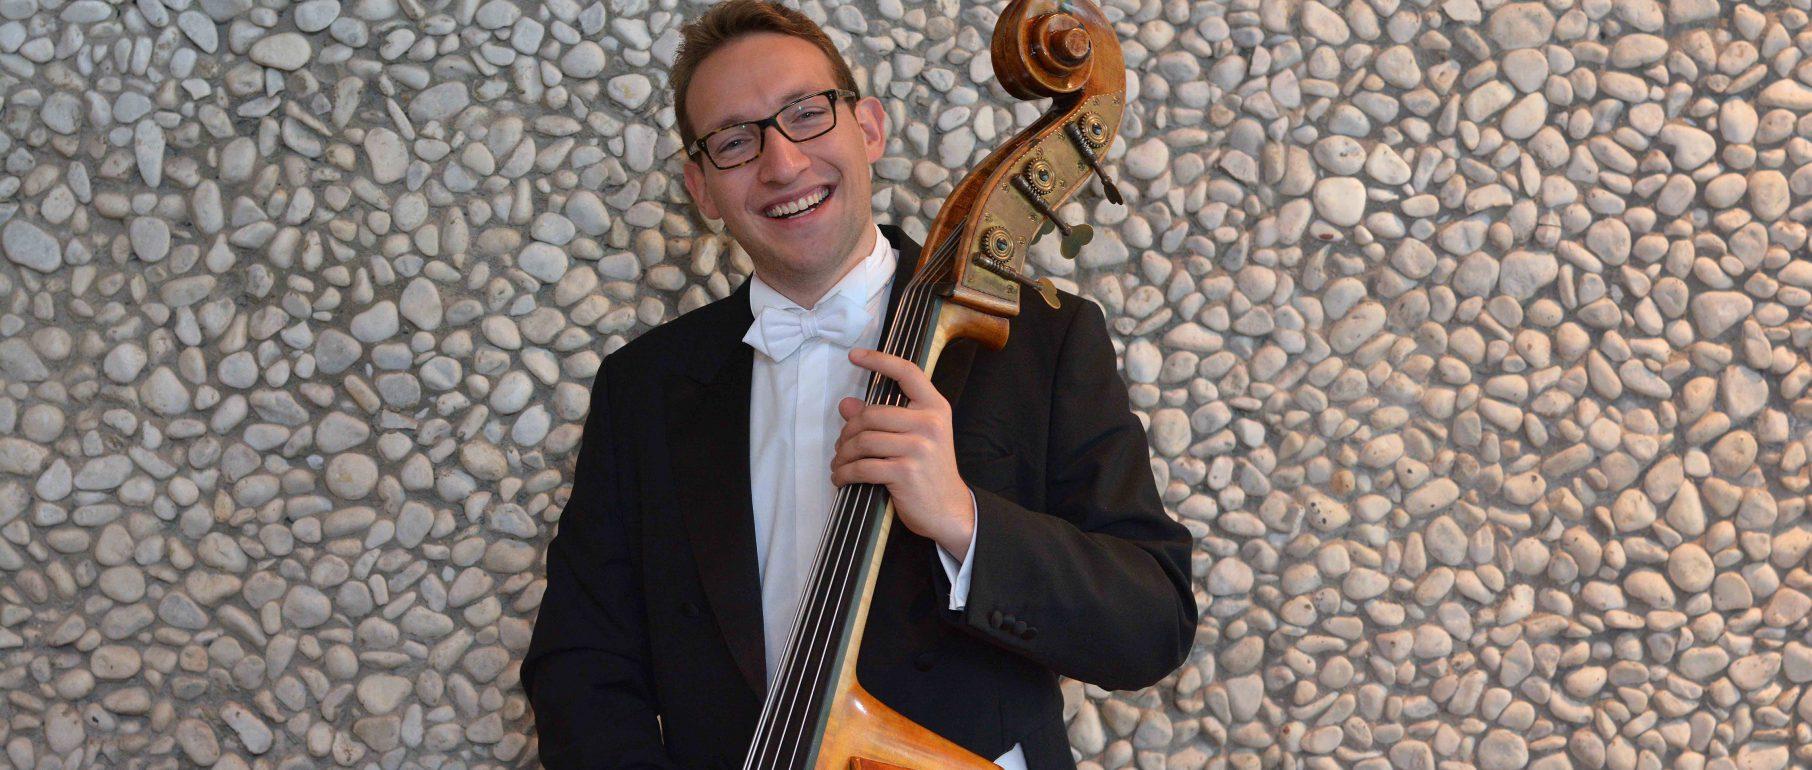 Matthias Botzet, Kontrabass (Solo)